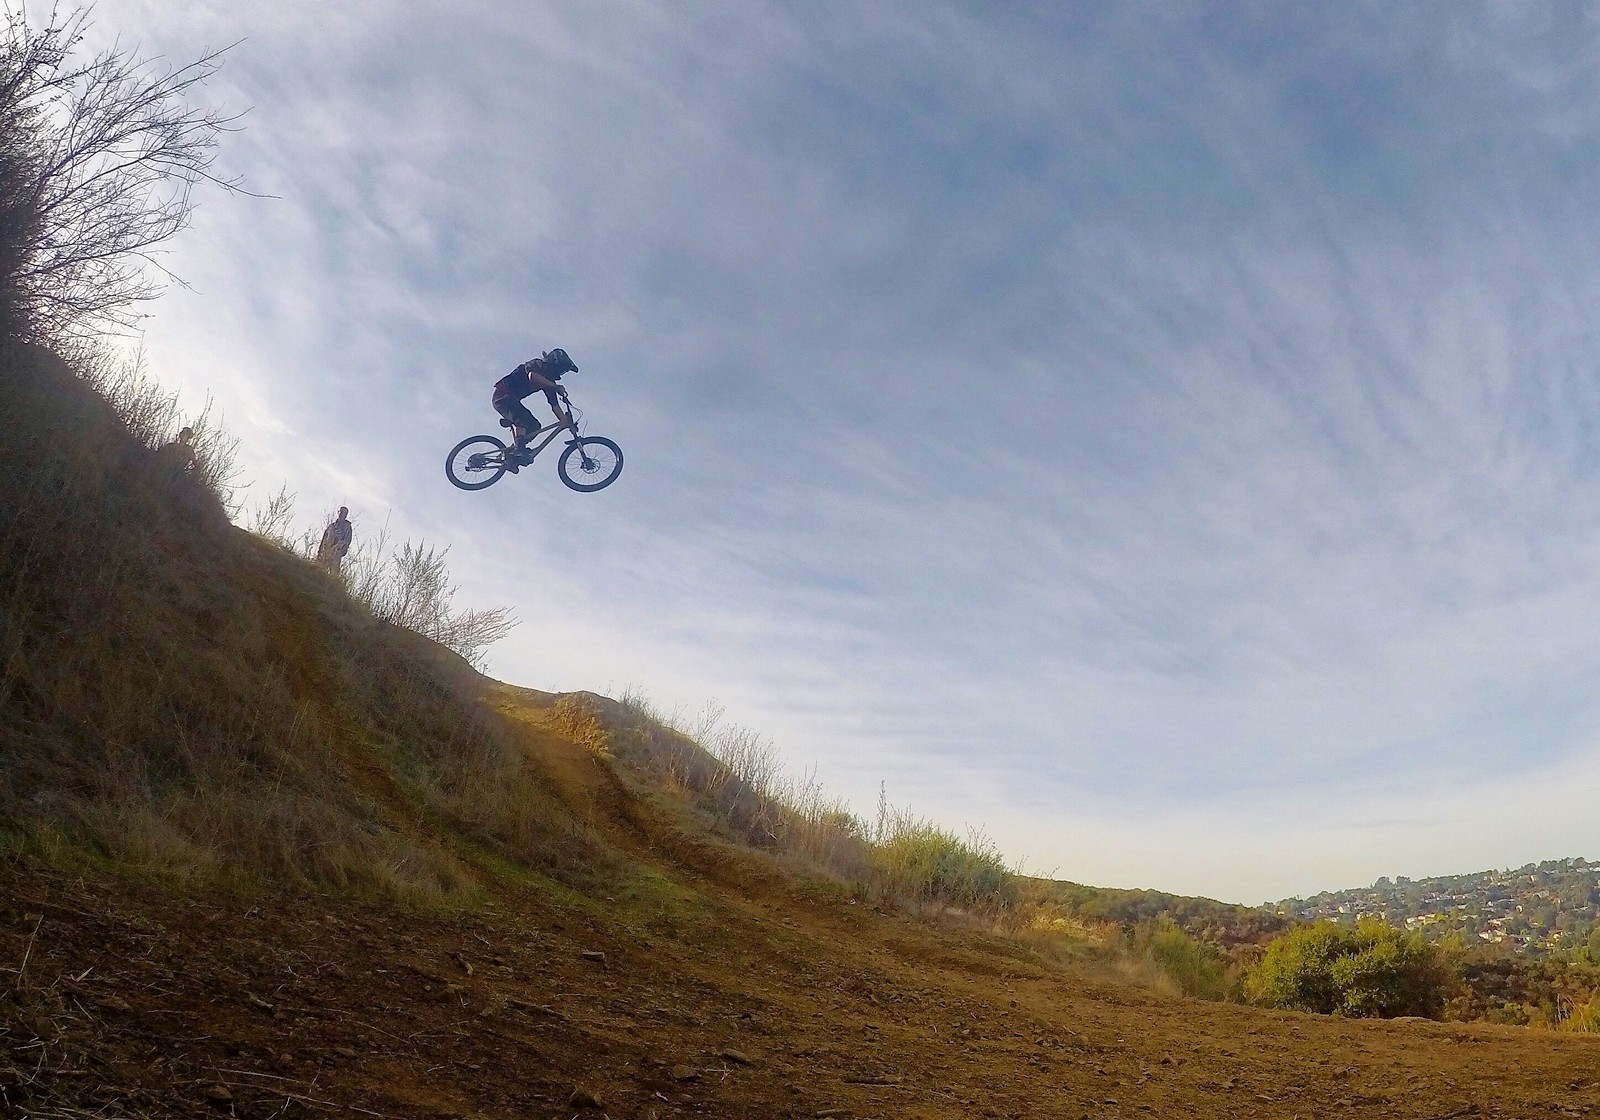 Sending It - Scharney127 - Mountain Biking Pictures - Vital MTB